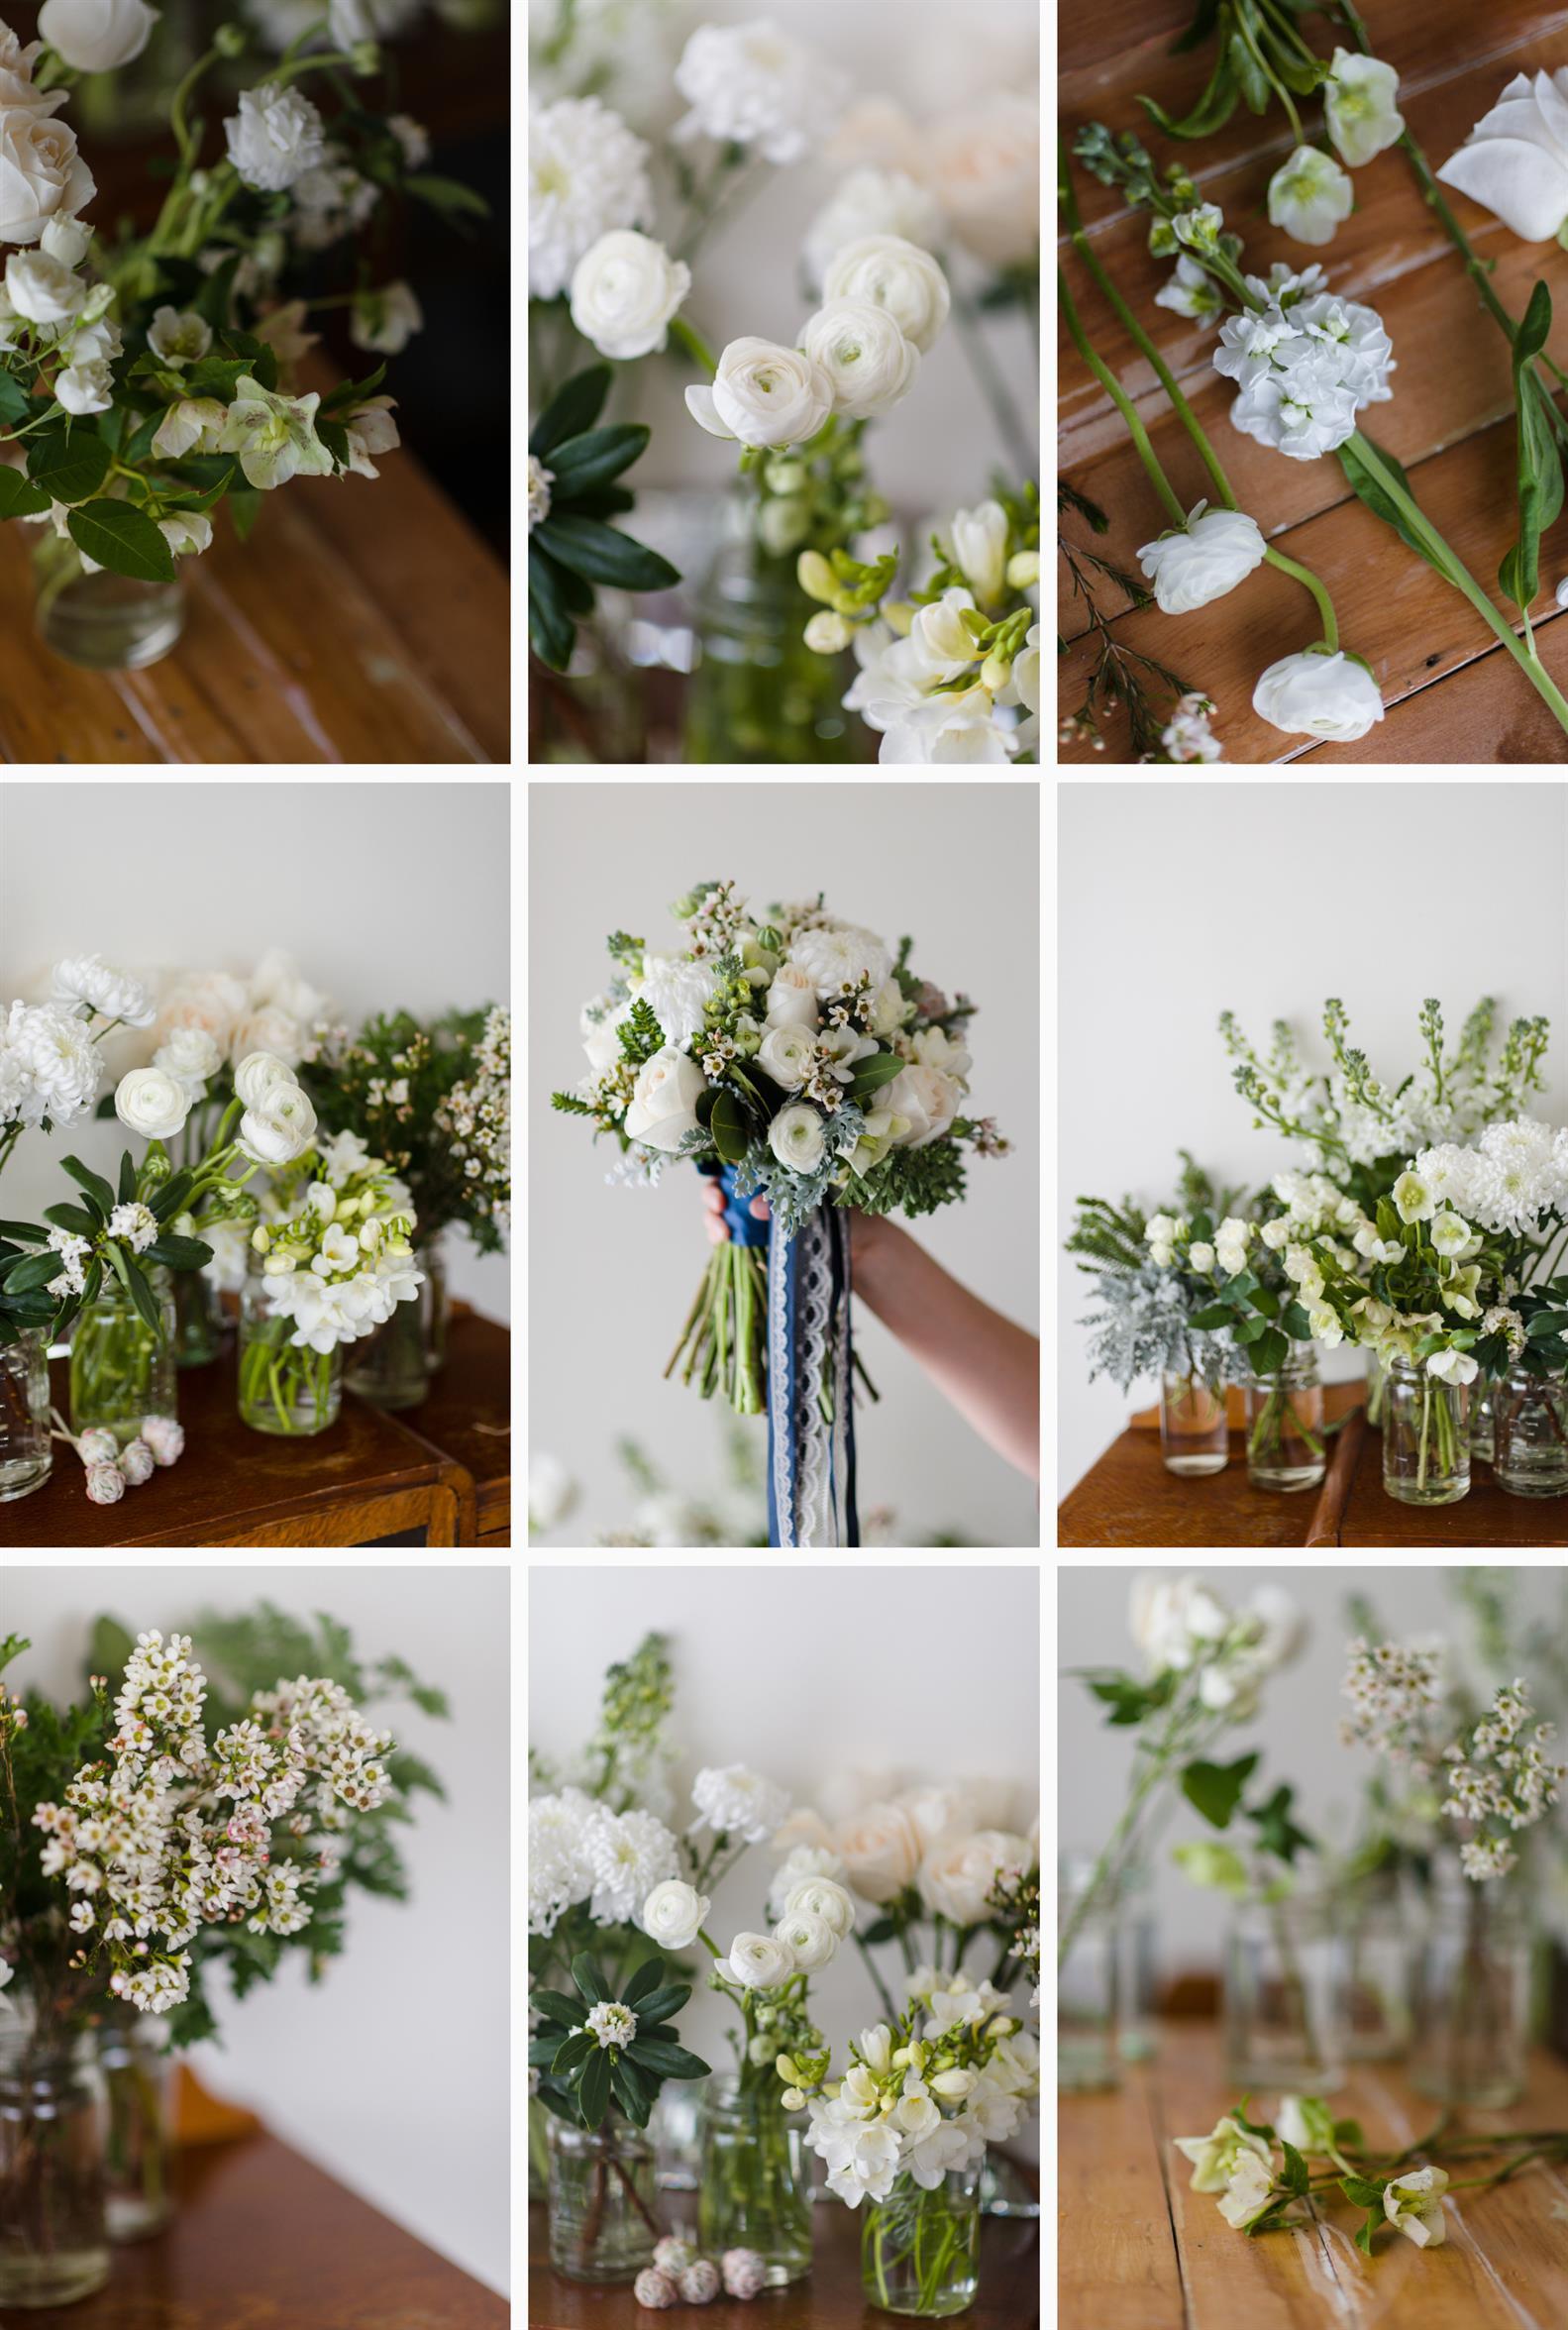 Wedding Bouquet Recipe ~ Scentful Spring Bridal Bouquet